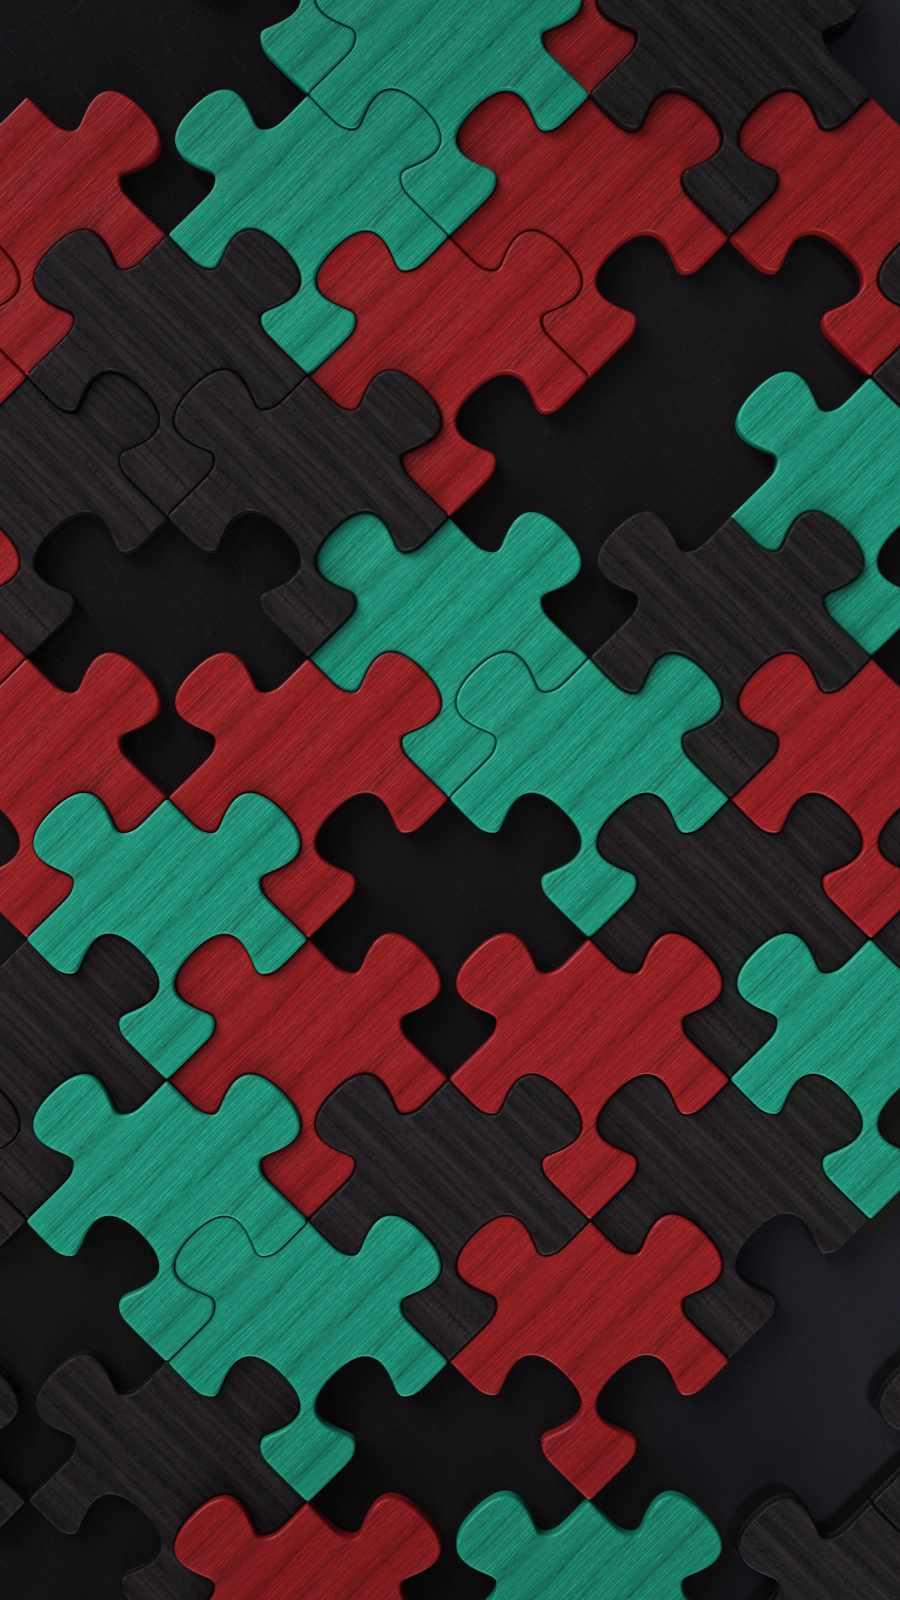 Puzzle iPhone Wallpaper